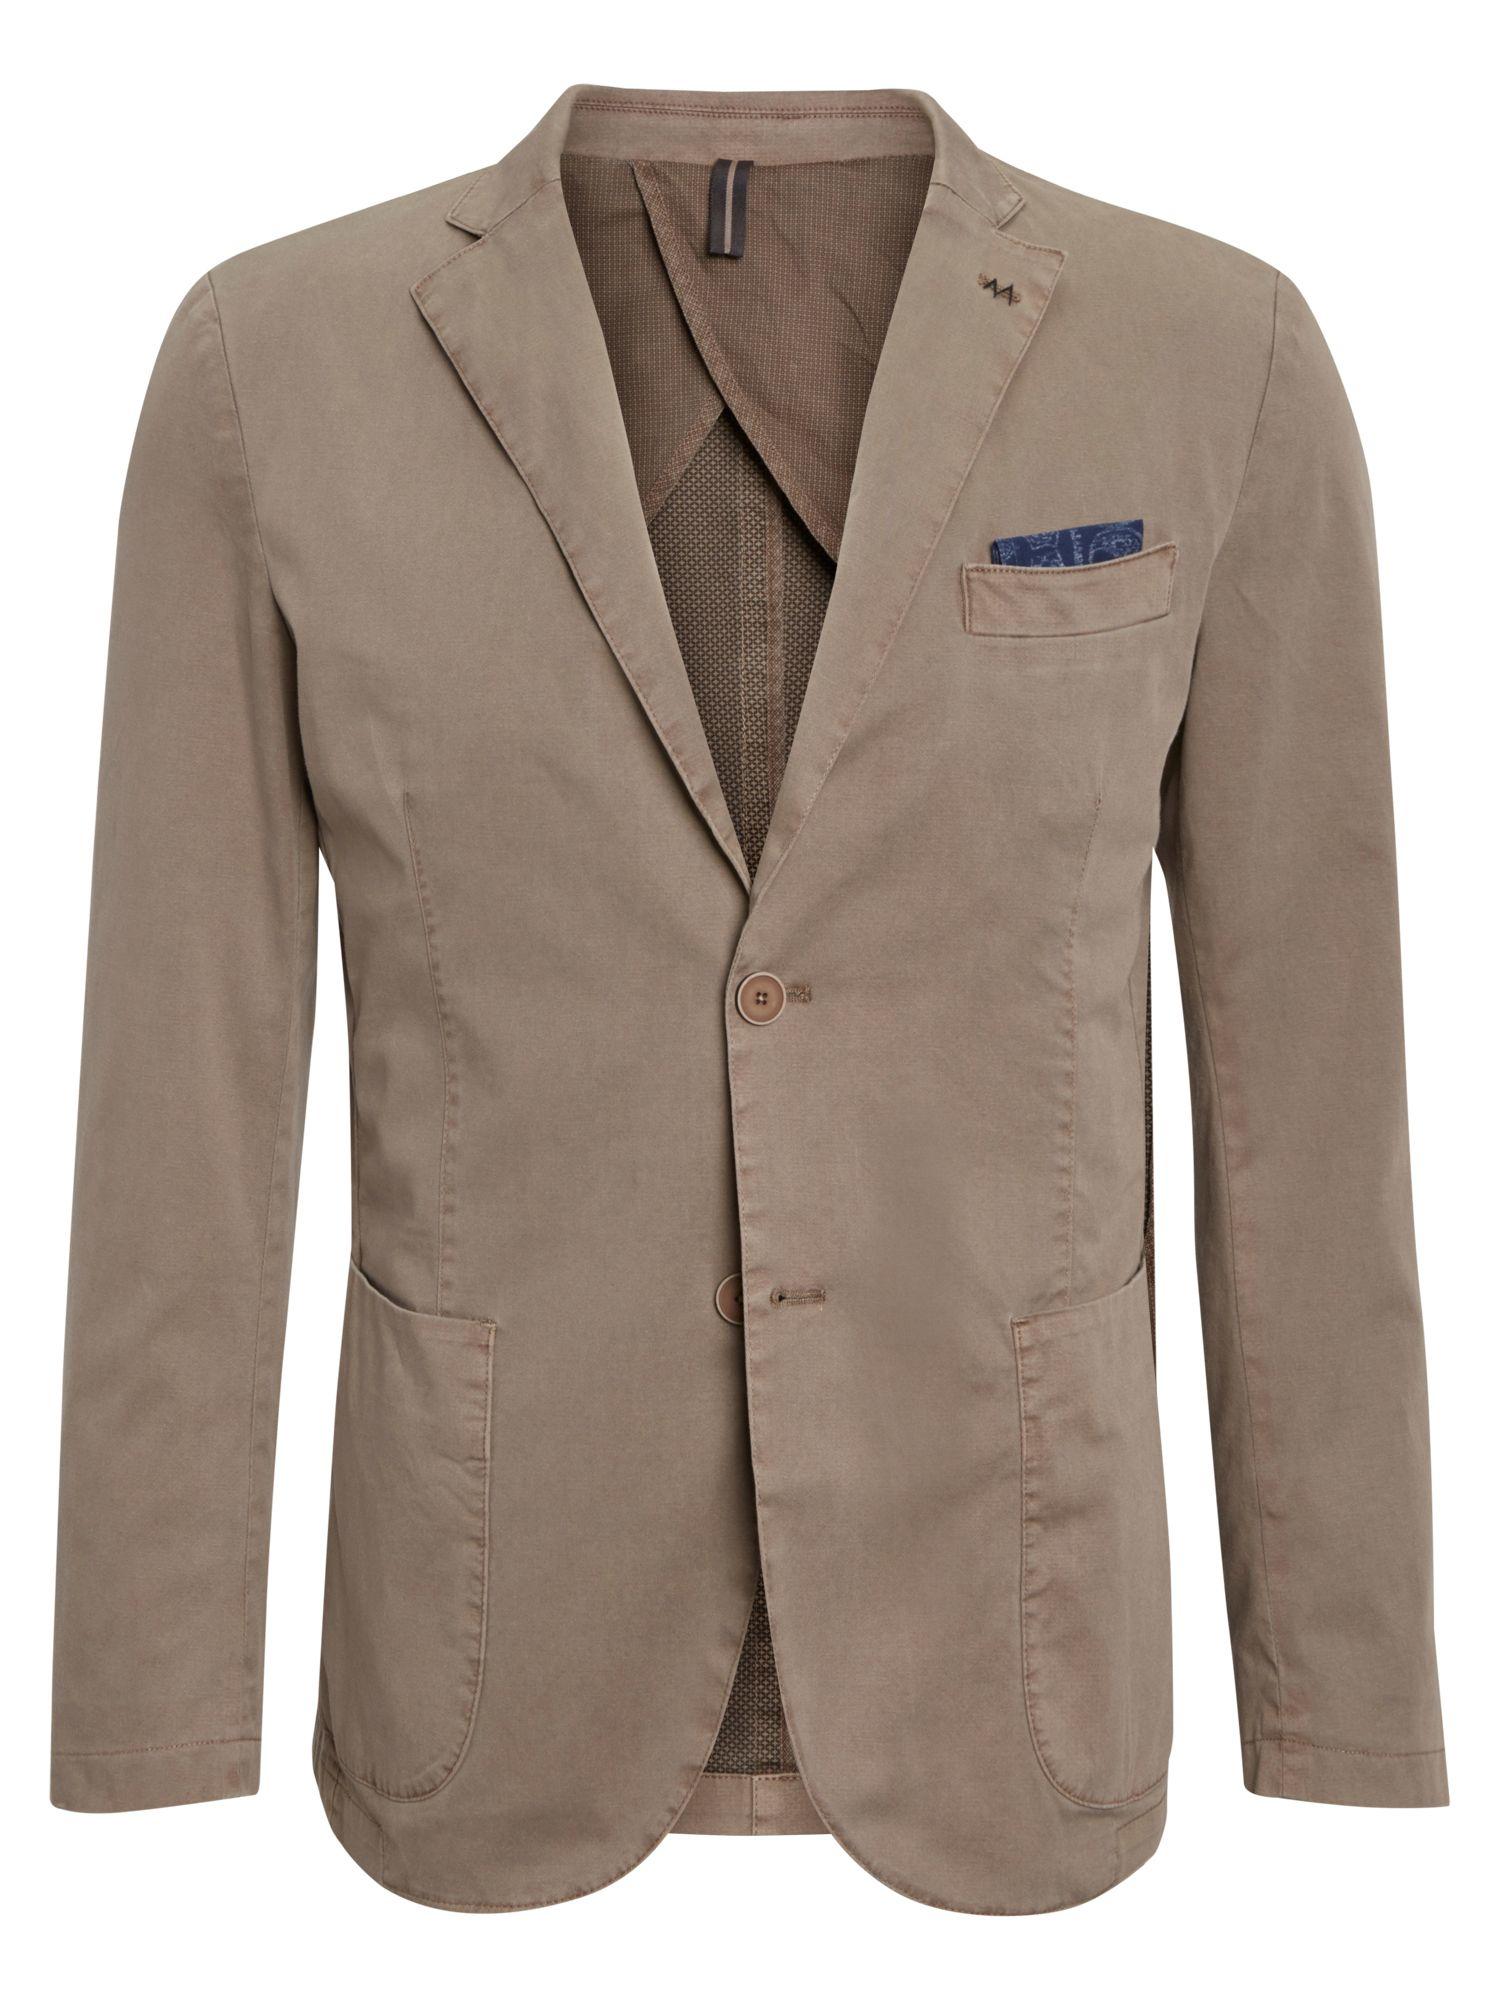 marc o 39 polo jacket in natural for men lyst. Black Bedroom Furniture Sets. Home Design Ideas